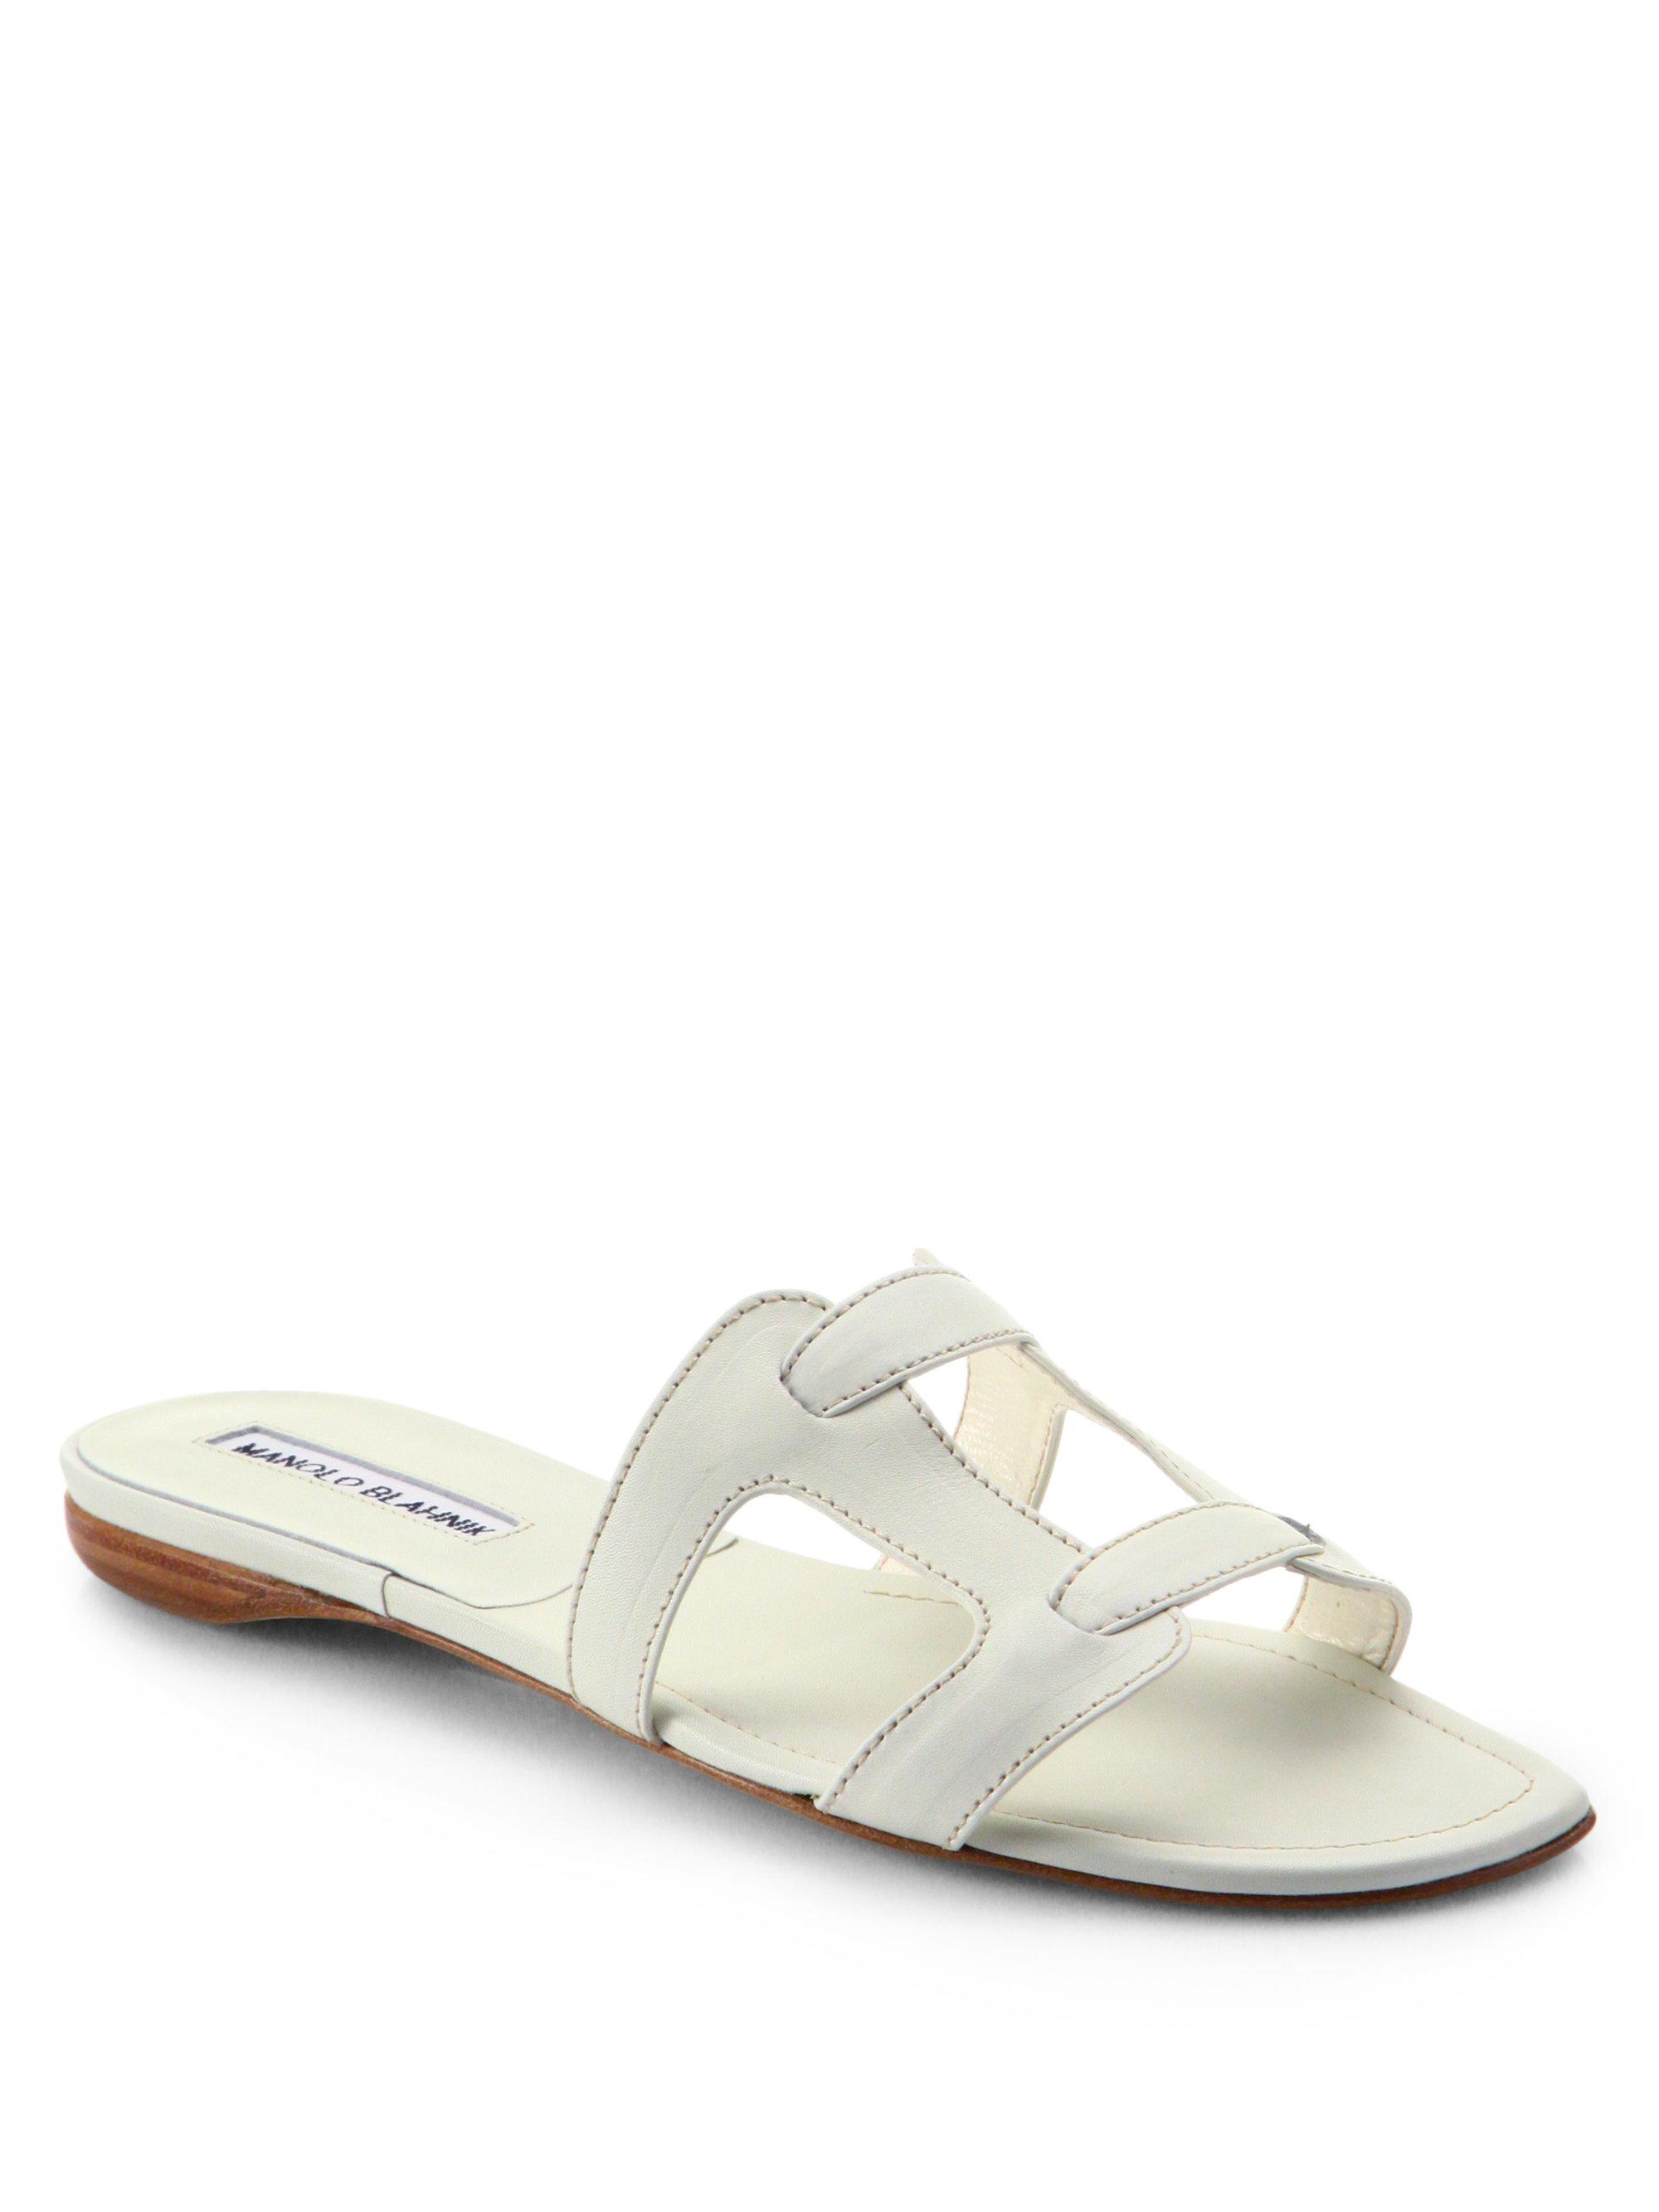 Manolo Blahnik Grella Leather Slide Sandals In White Lyst